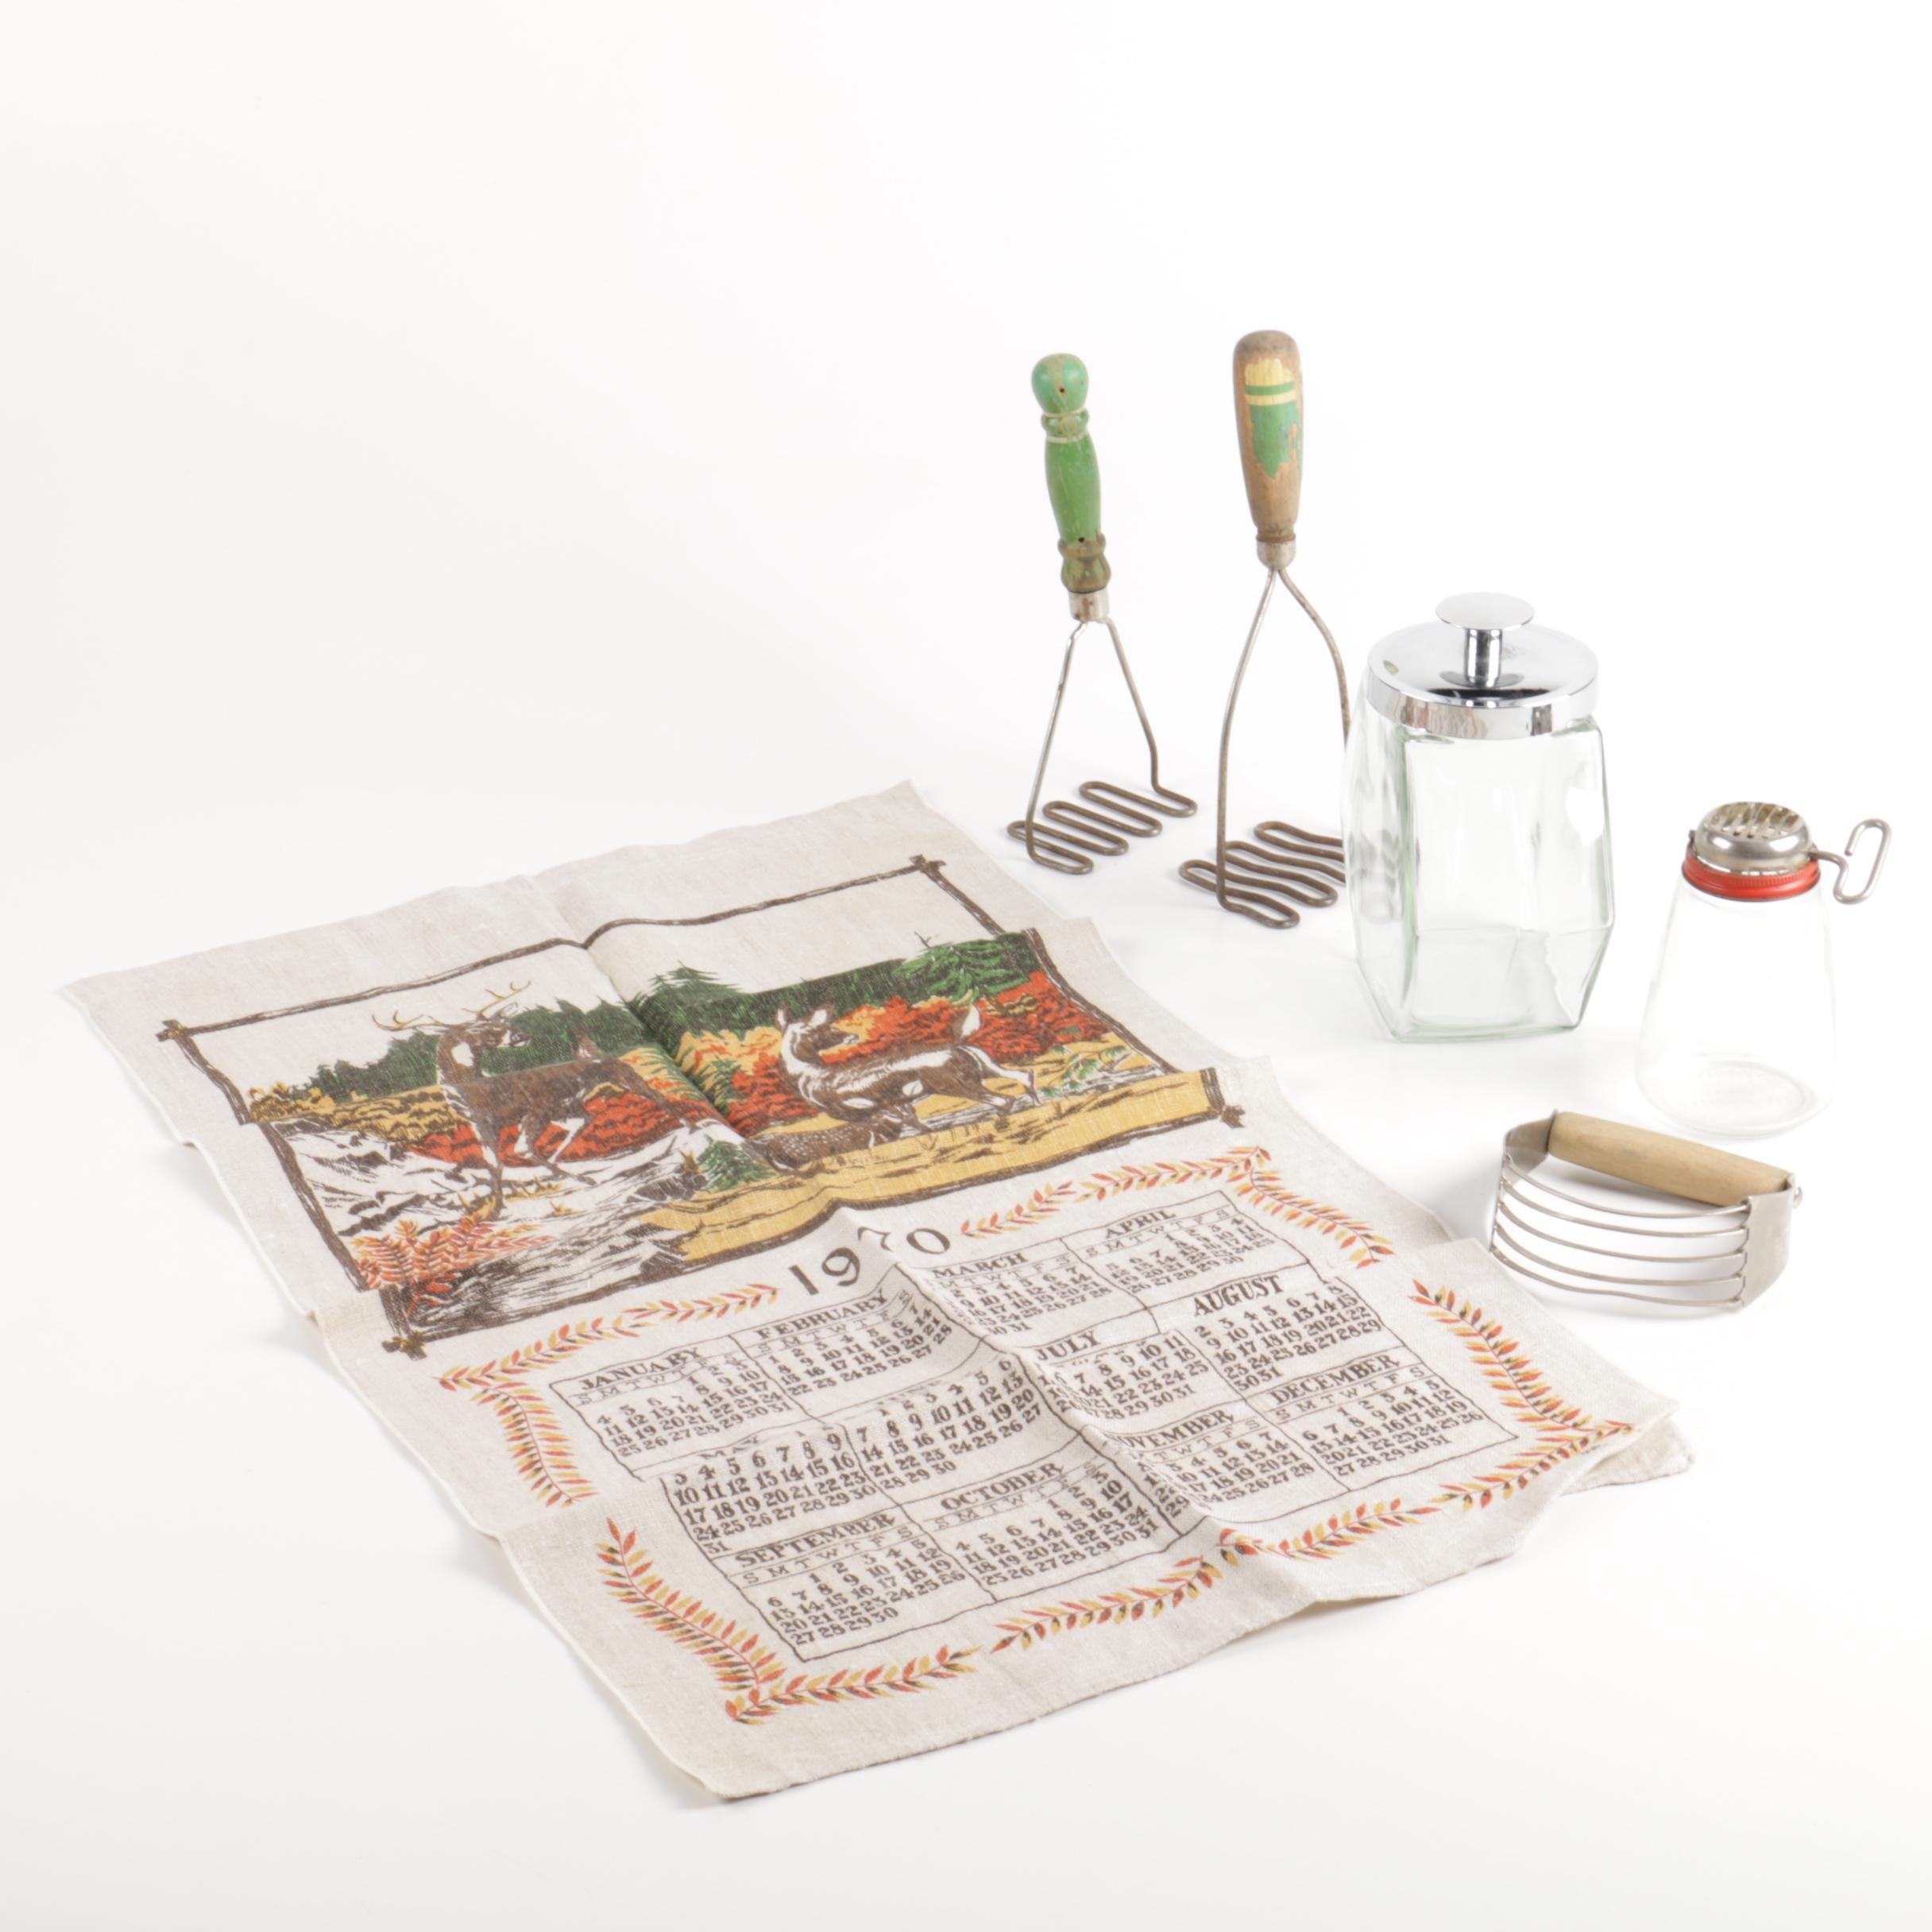 Vintage Kitchenware and Tea Towel